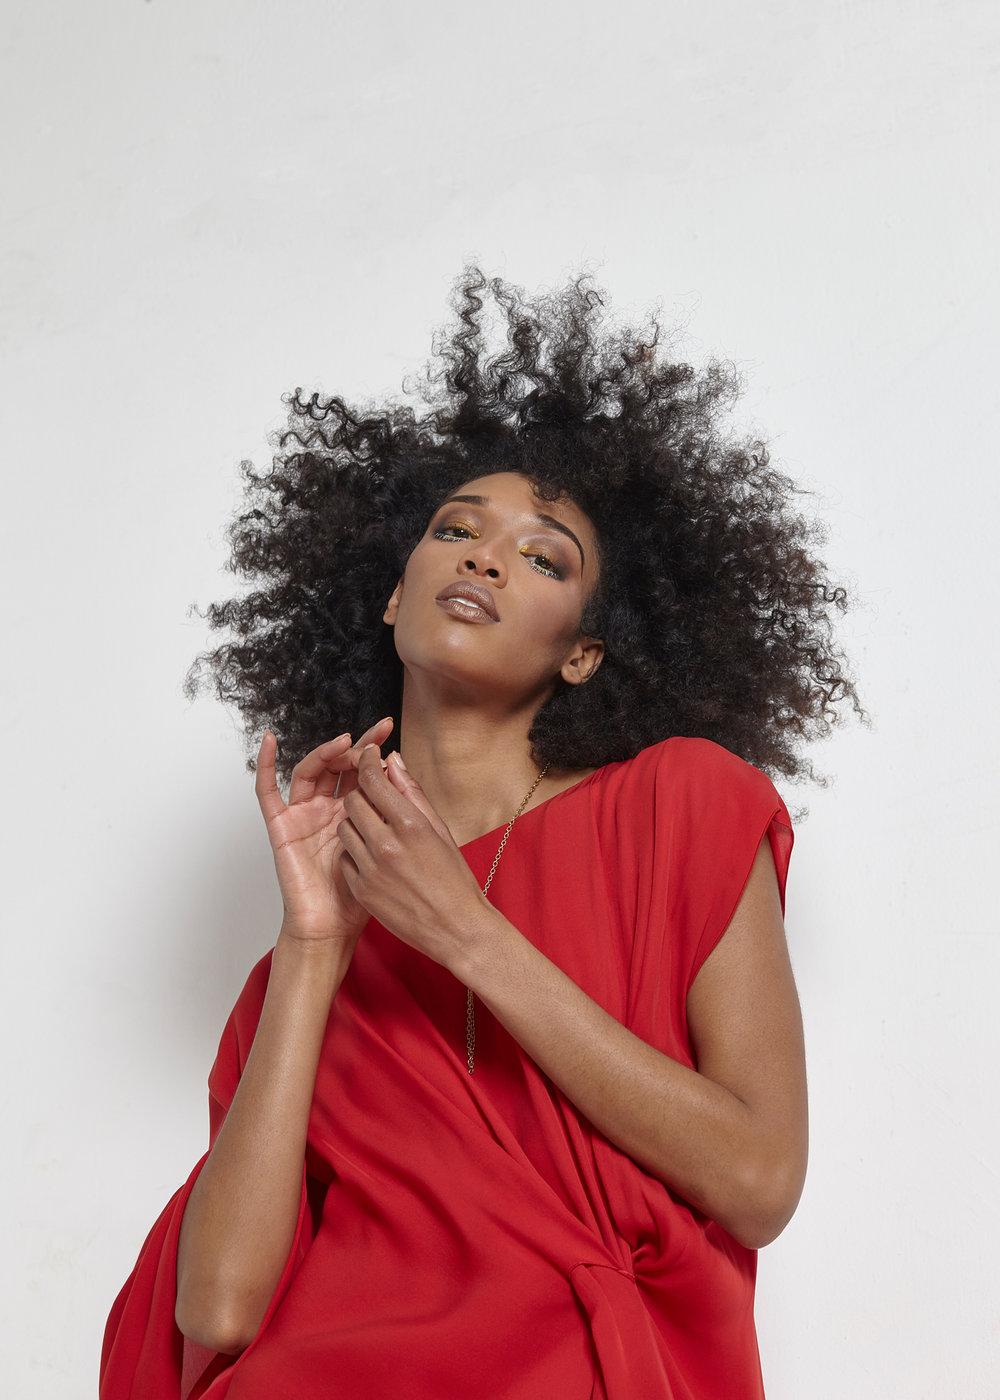 Photography:  Charles Ludeke   Model:   Alysia Beckford   Styling:  Sean Santiago   Hair:  Nigella   Makeup:  Slater Stanley